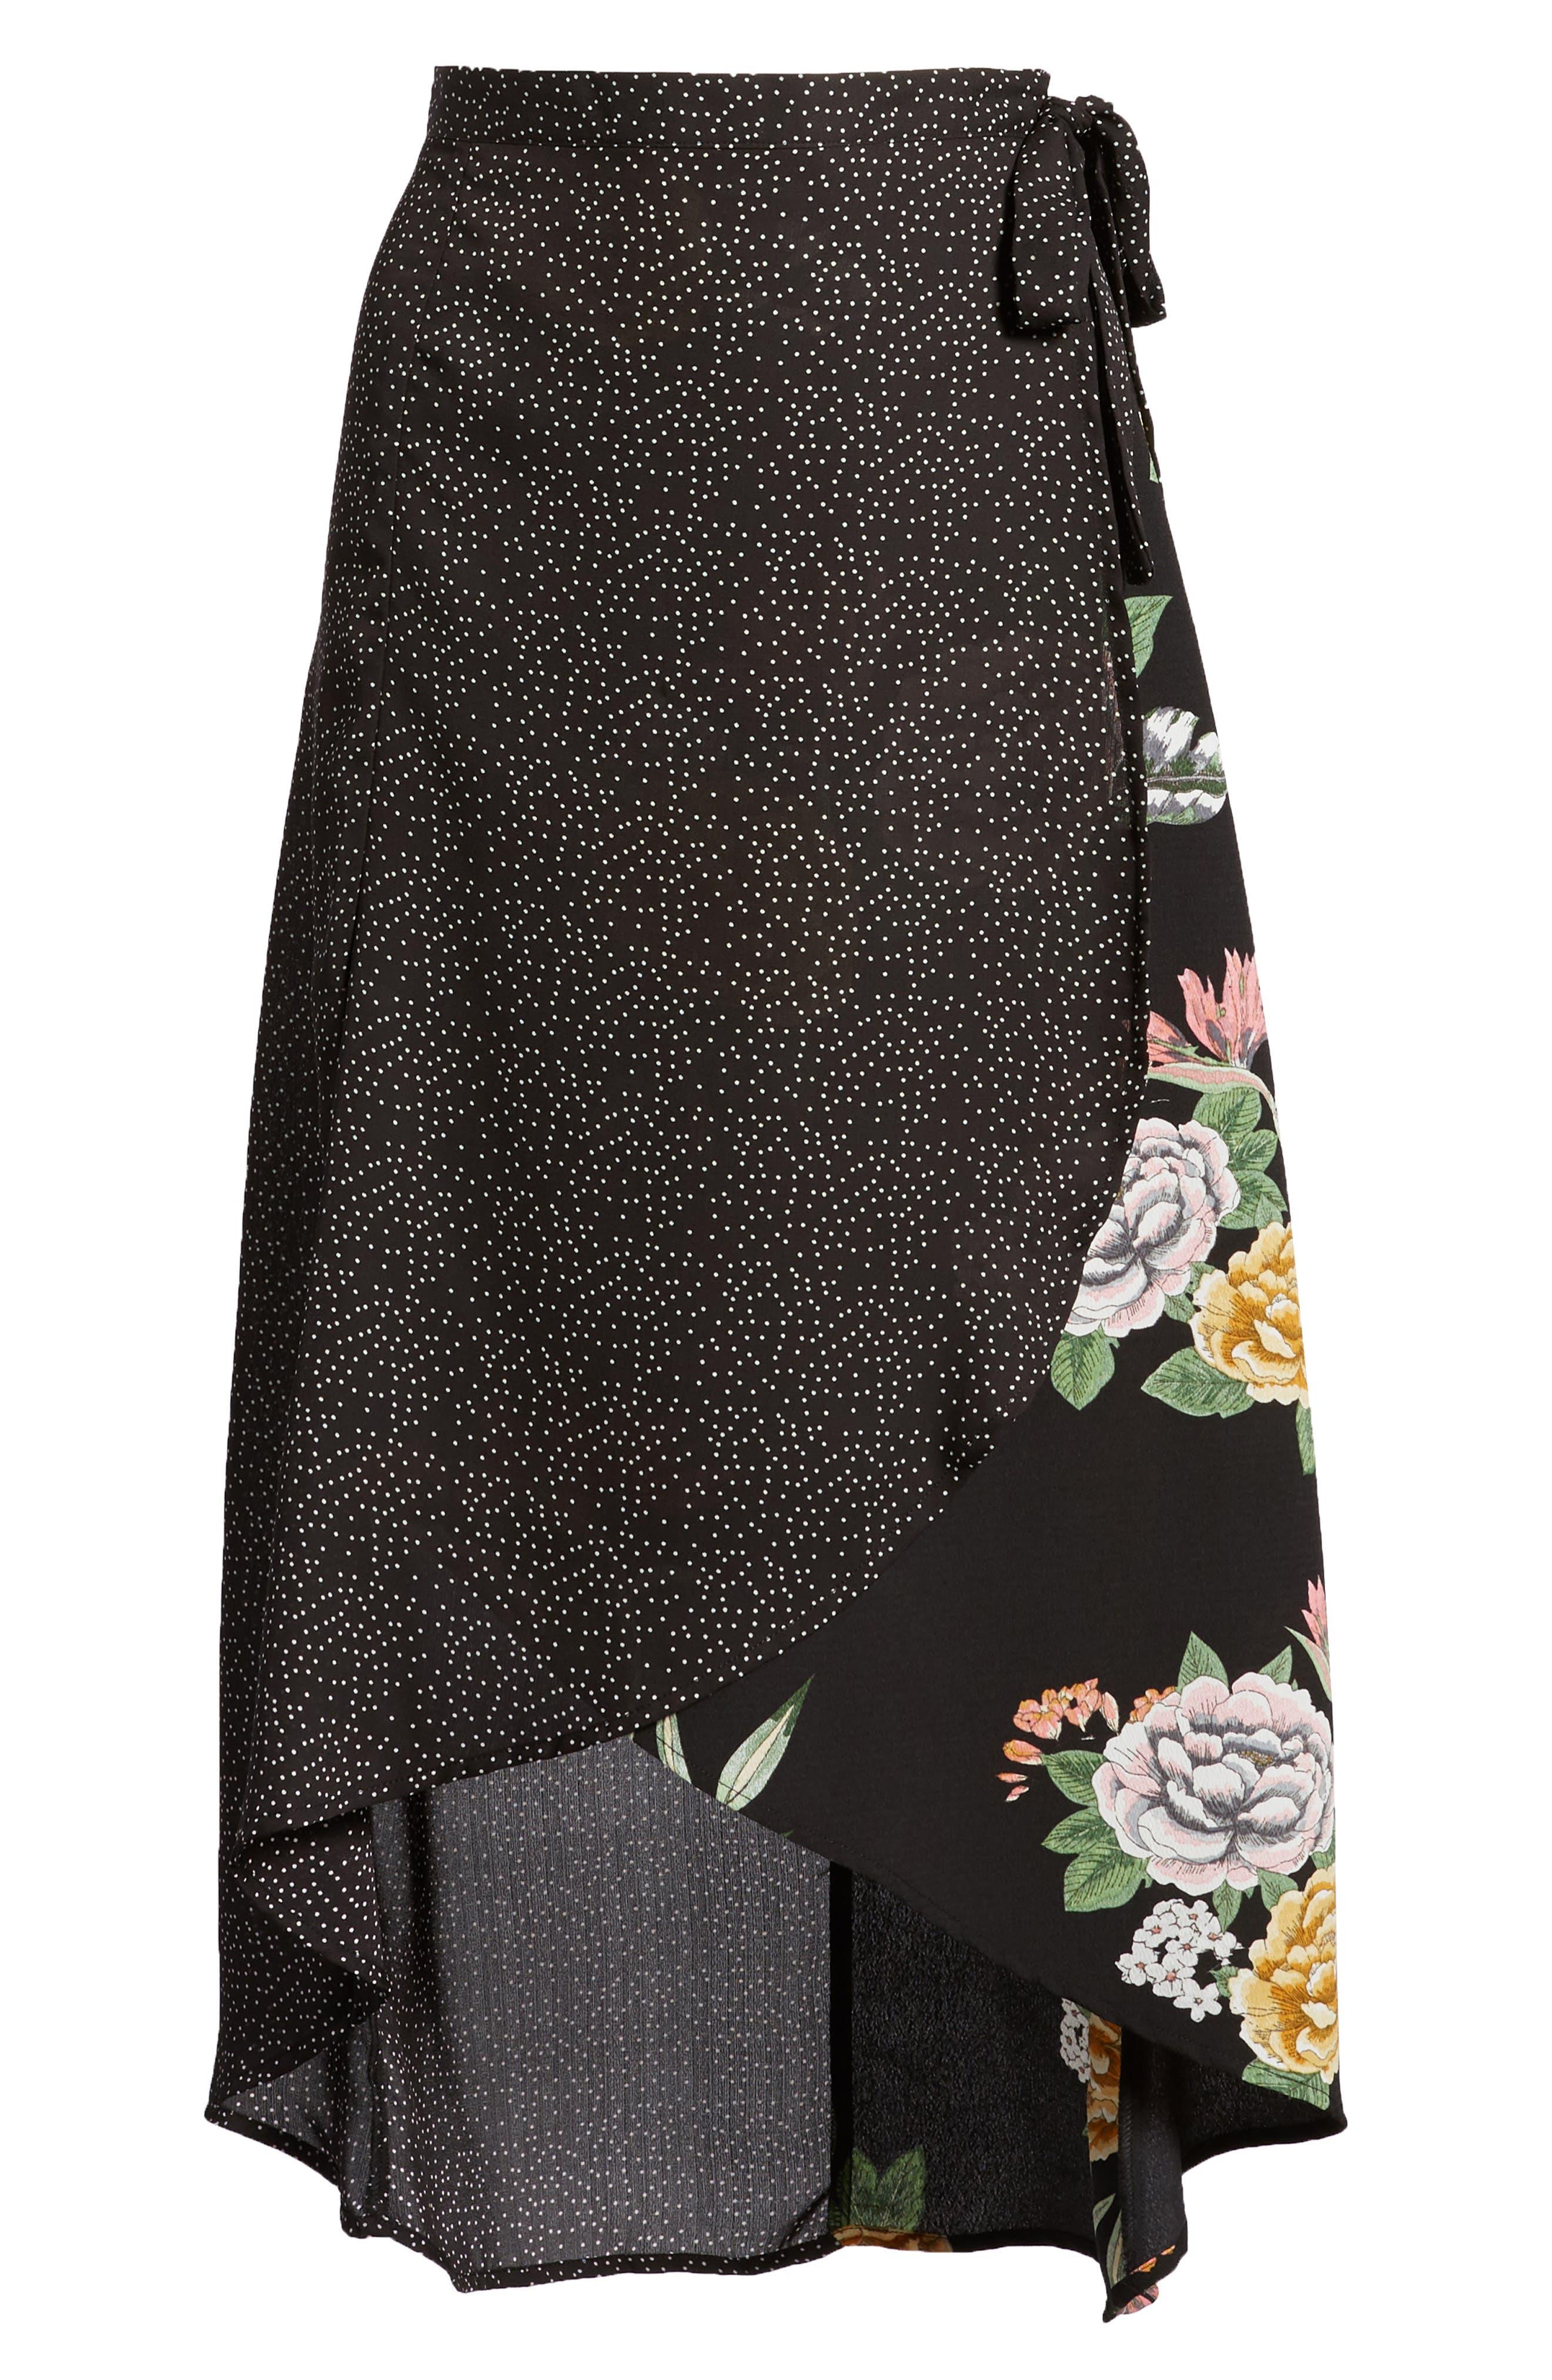 Bishop + Young Enchanted Garden Mix Media Skirt,                             Alternate thumbnail 6, color,                             ENCHANTED GARDEN PRINT